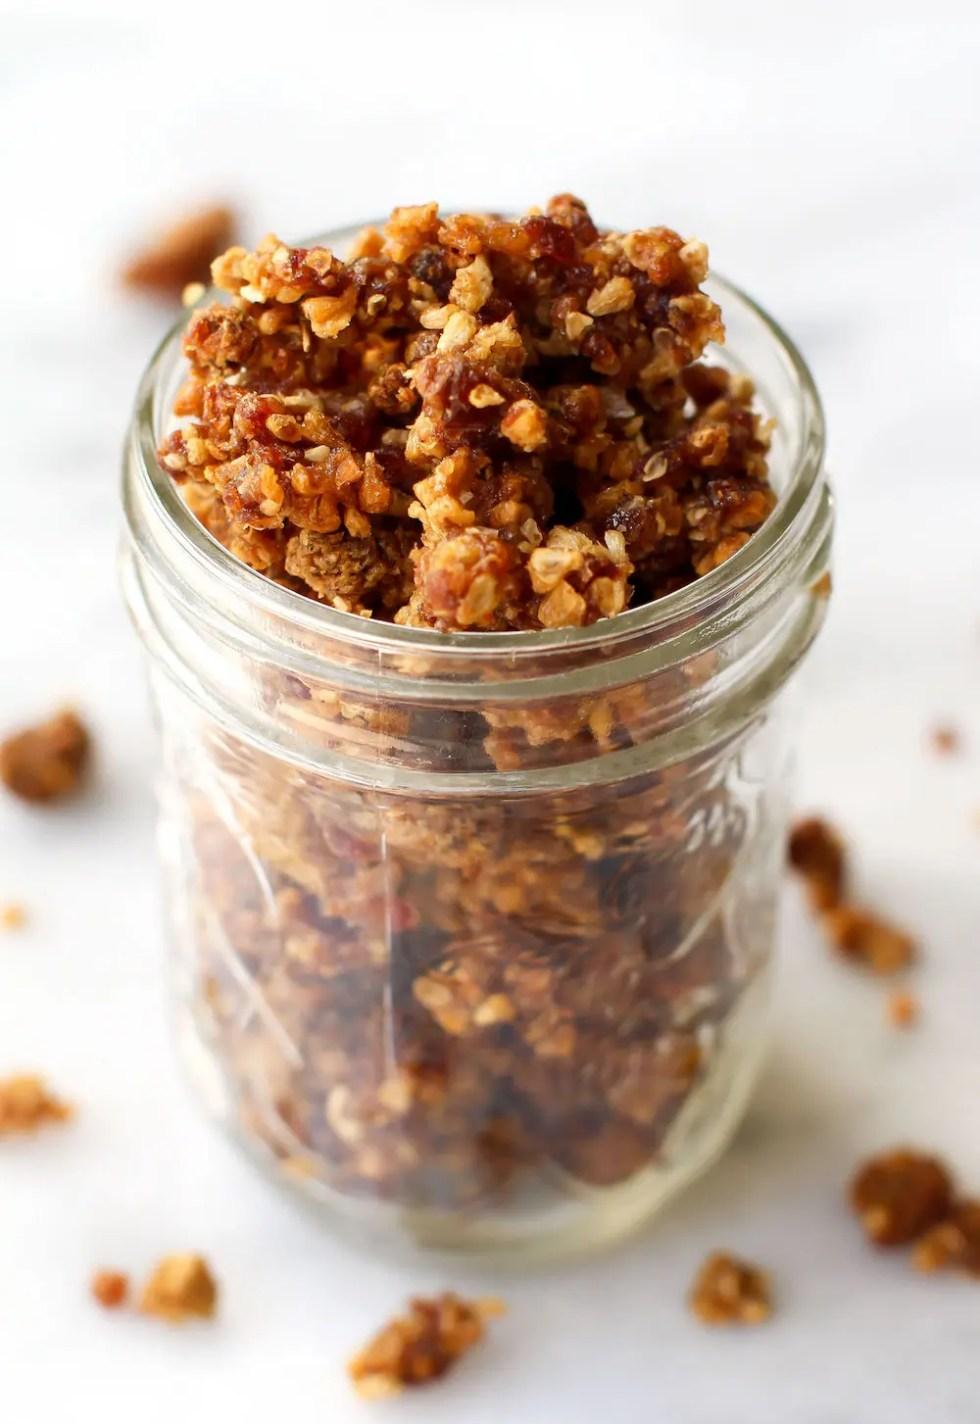 Grain Free Rawnola Recipe (2 ways!) | Vegan, Raw, Nut-Free